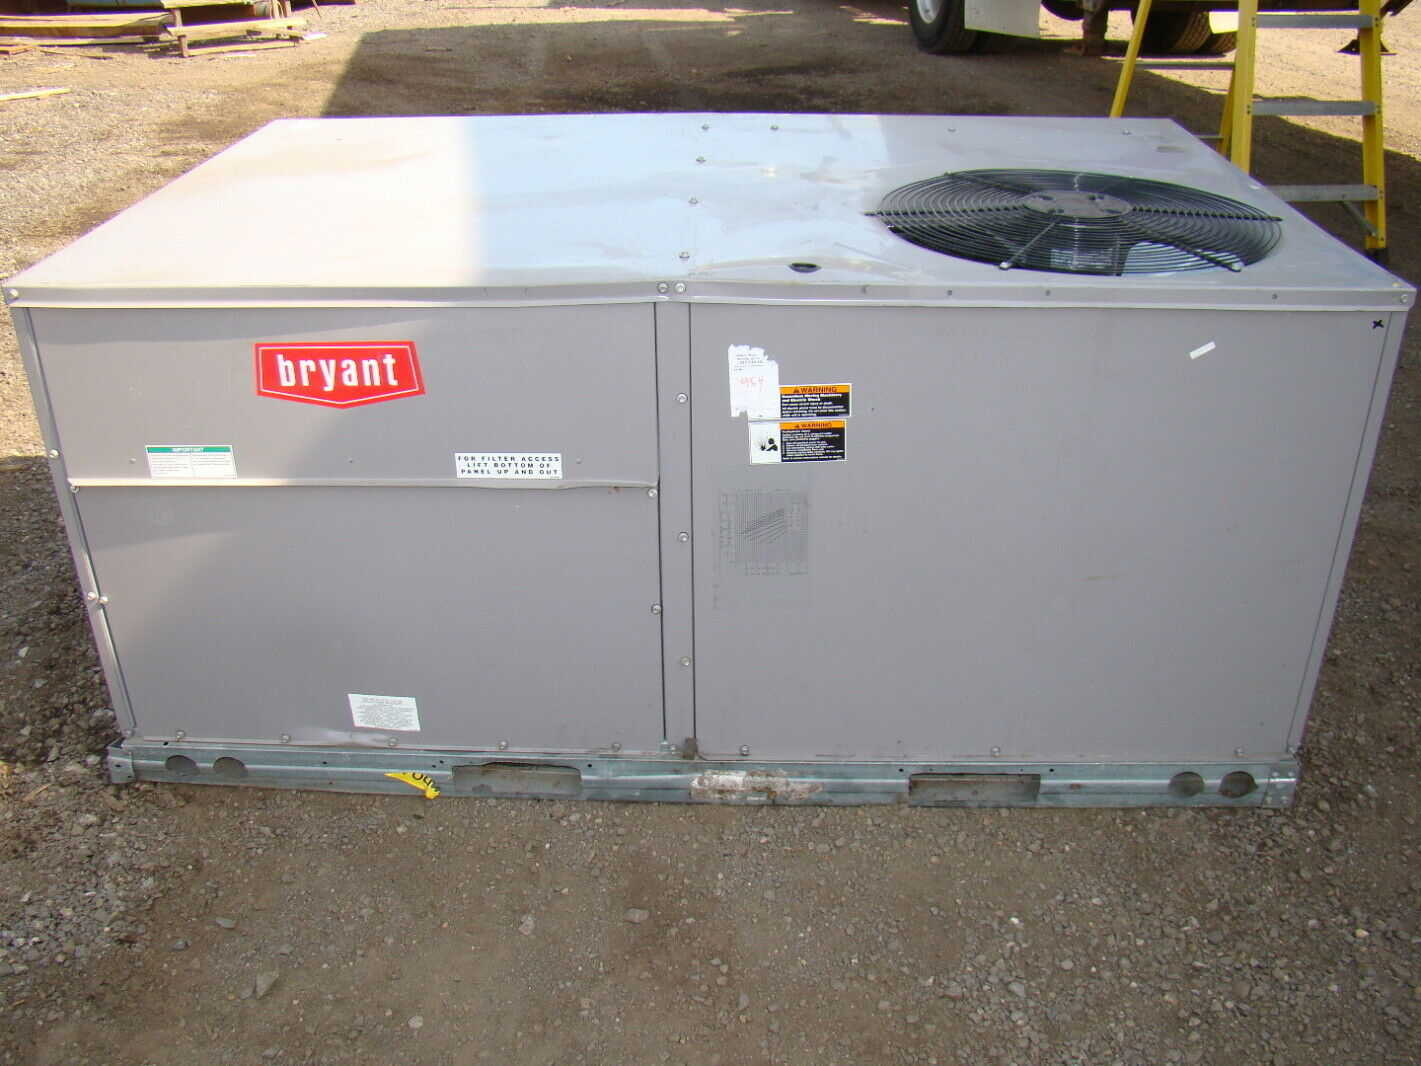 bryant 4 ton 78,499 btu air conditioning unit 460v | ebay